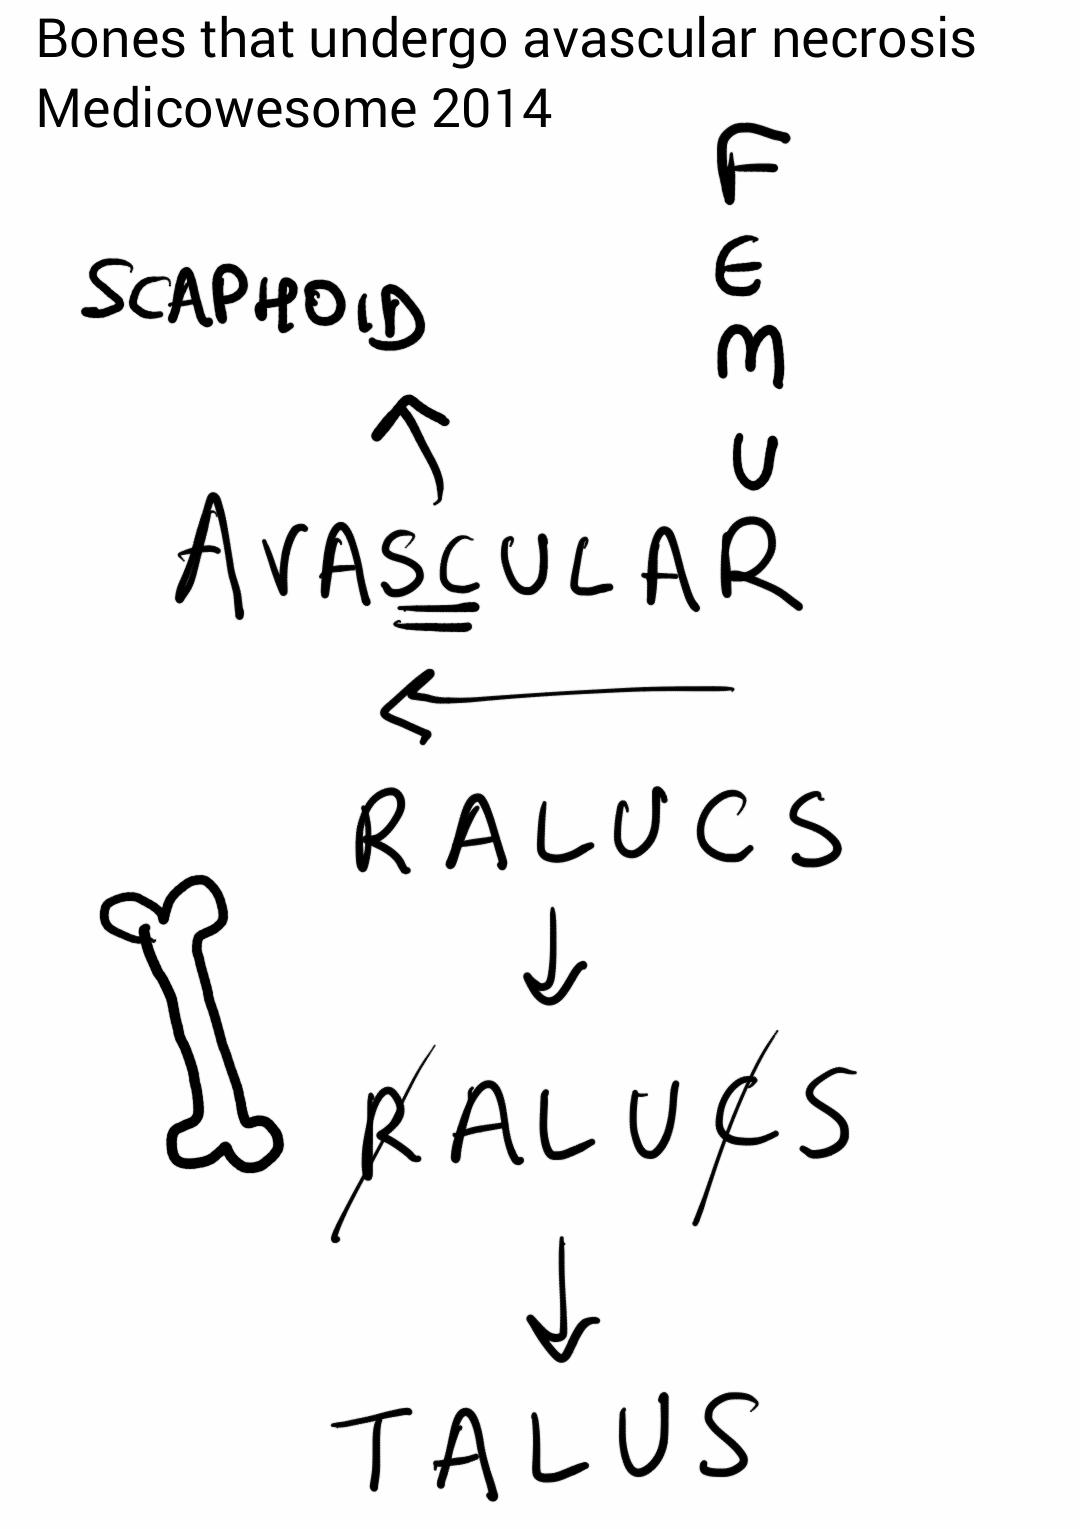 Medicowesome: Bones that undergo avascular necrosis mnemonic